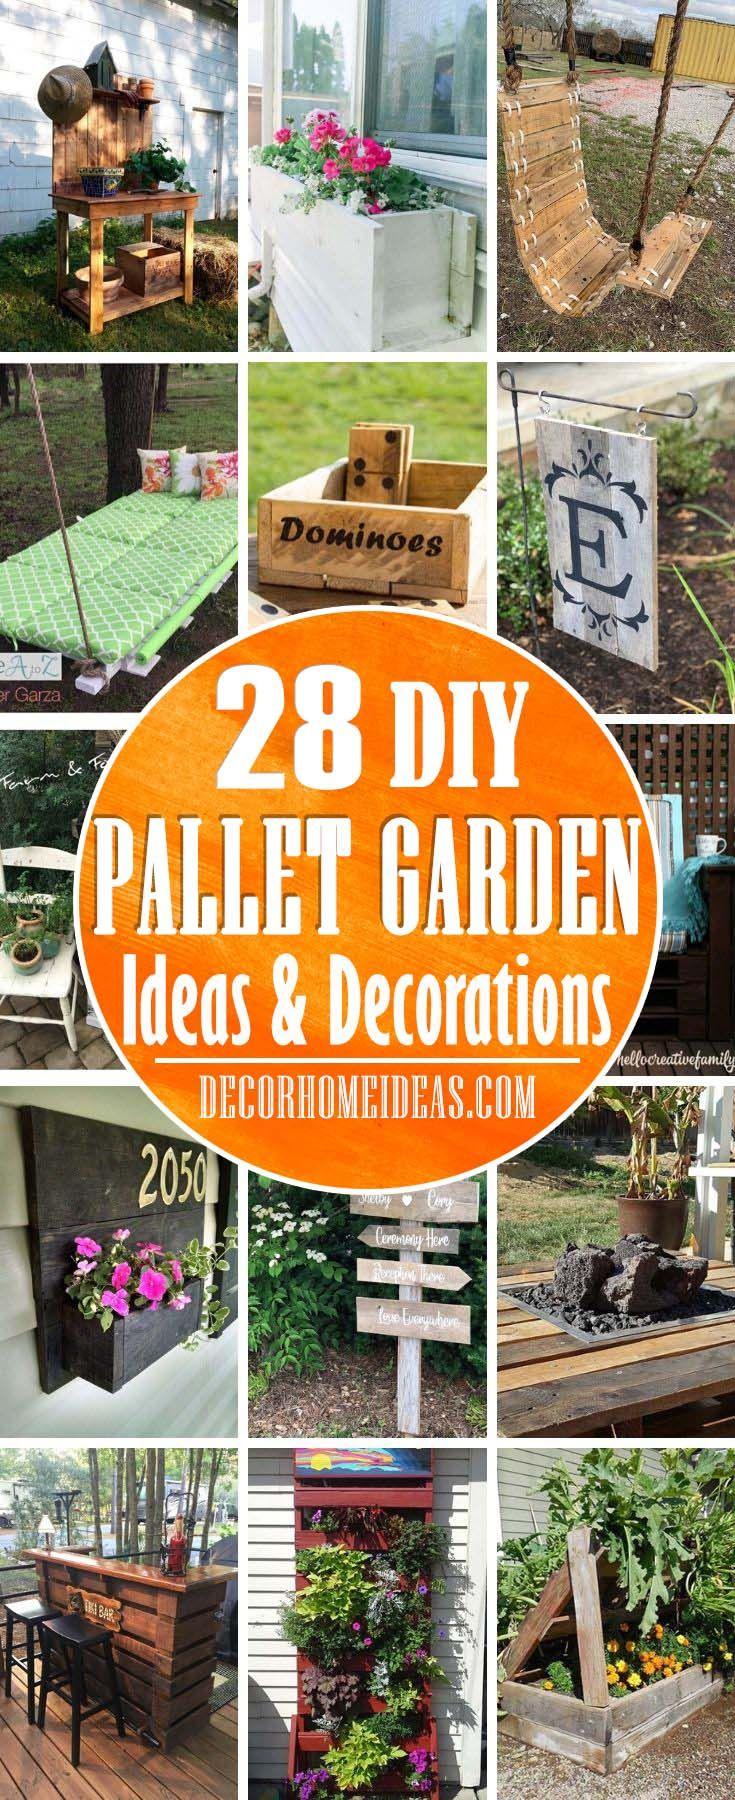 28 Impressive Diy Pallet Garden Ideas To Upcycle Your Wooden Pallets Pallets Garden Pallet Garden Pallet Diy